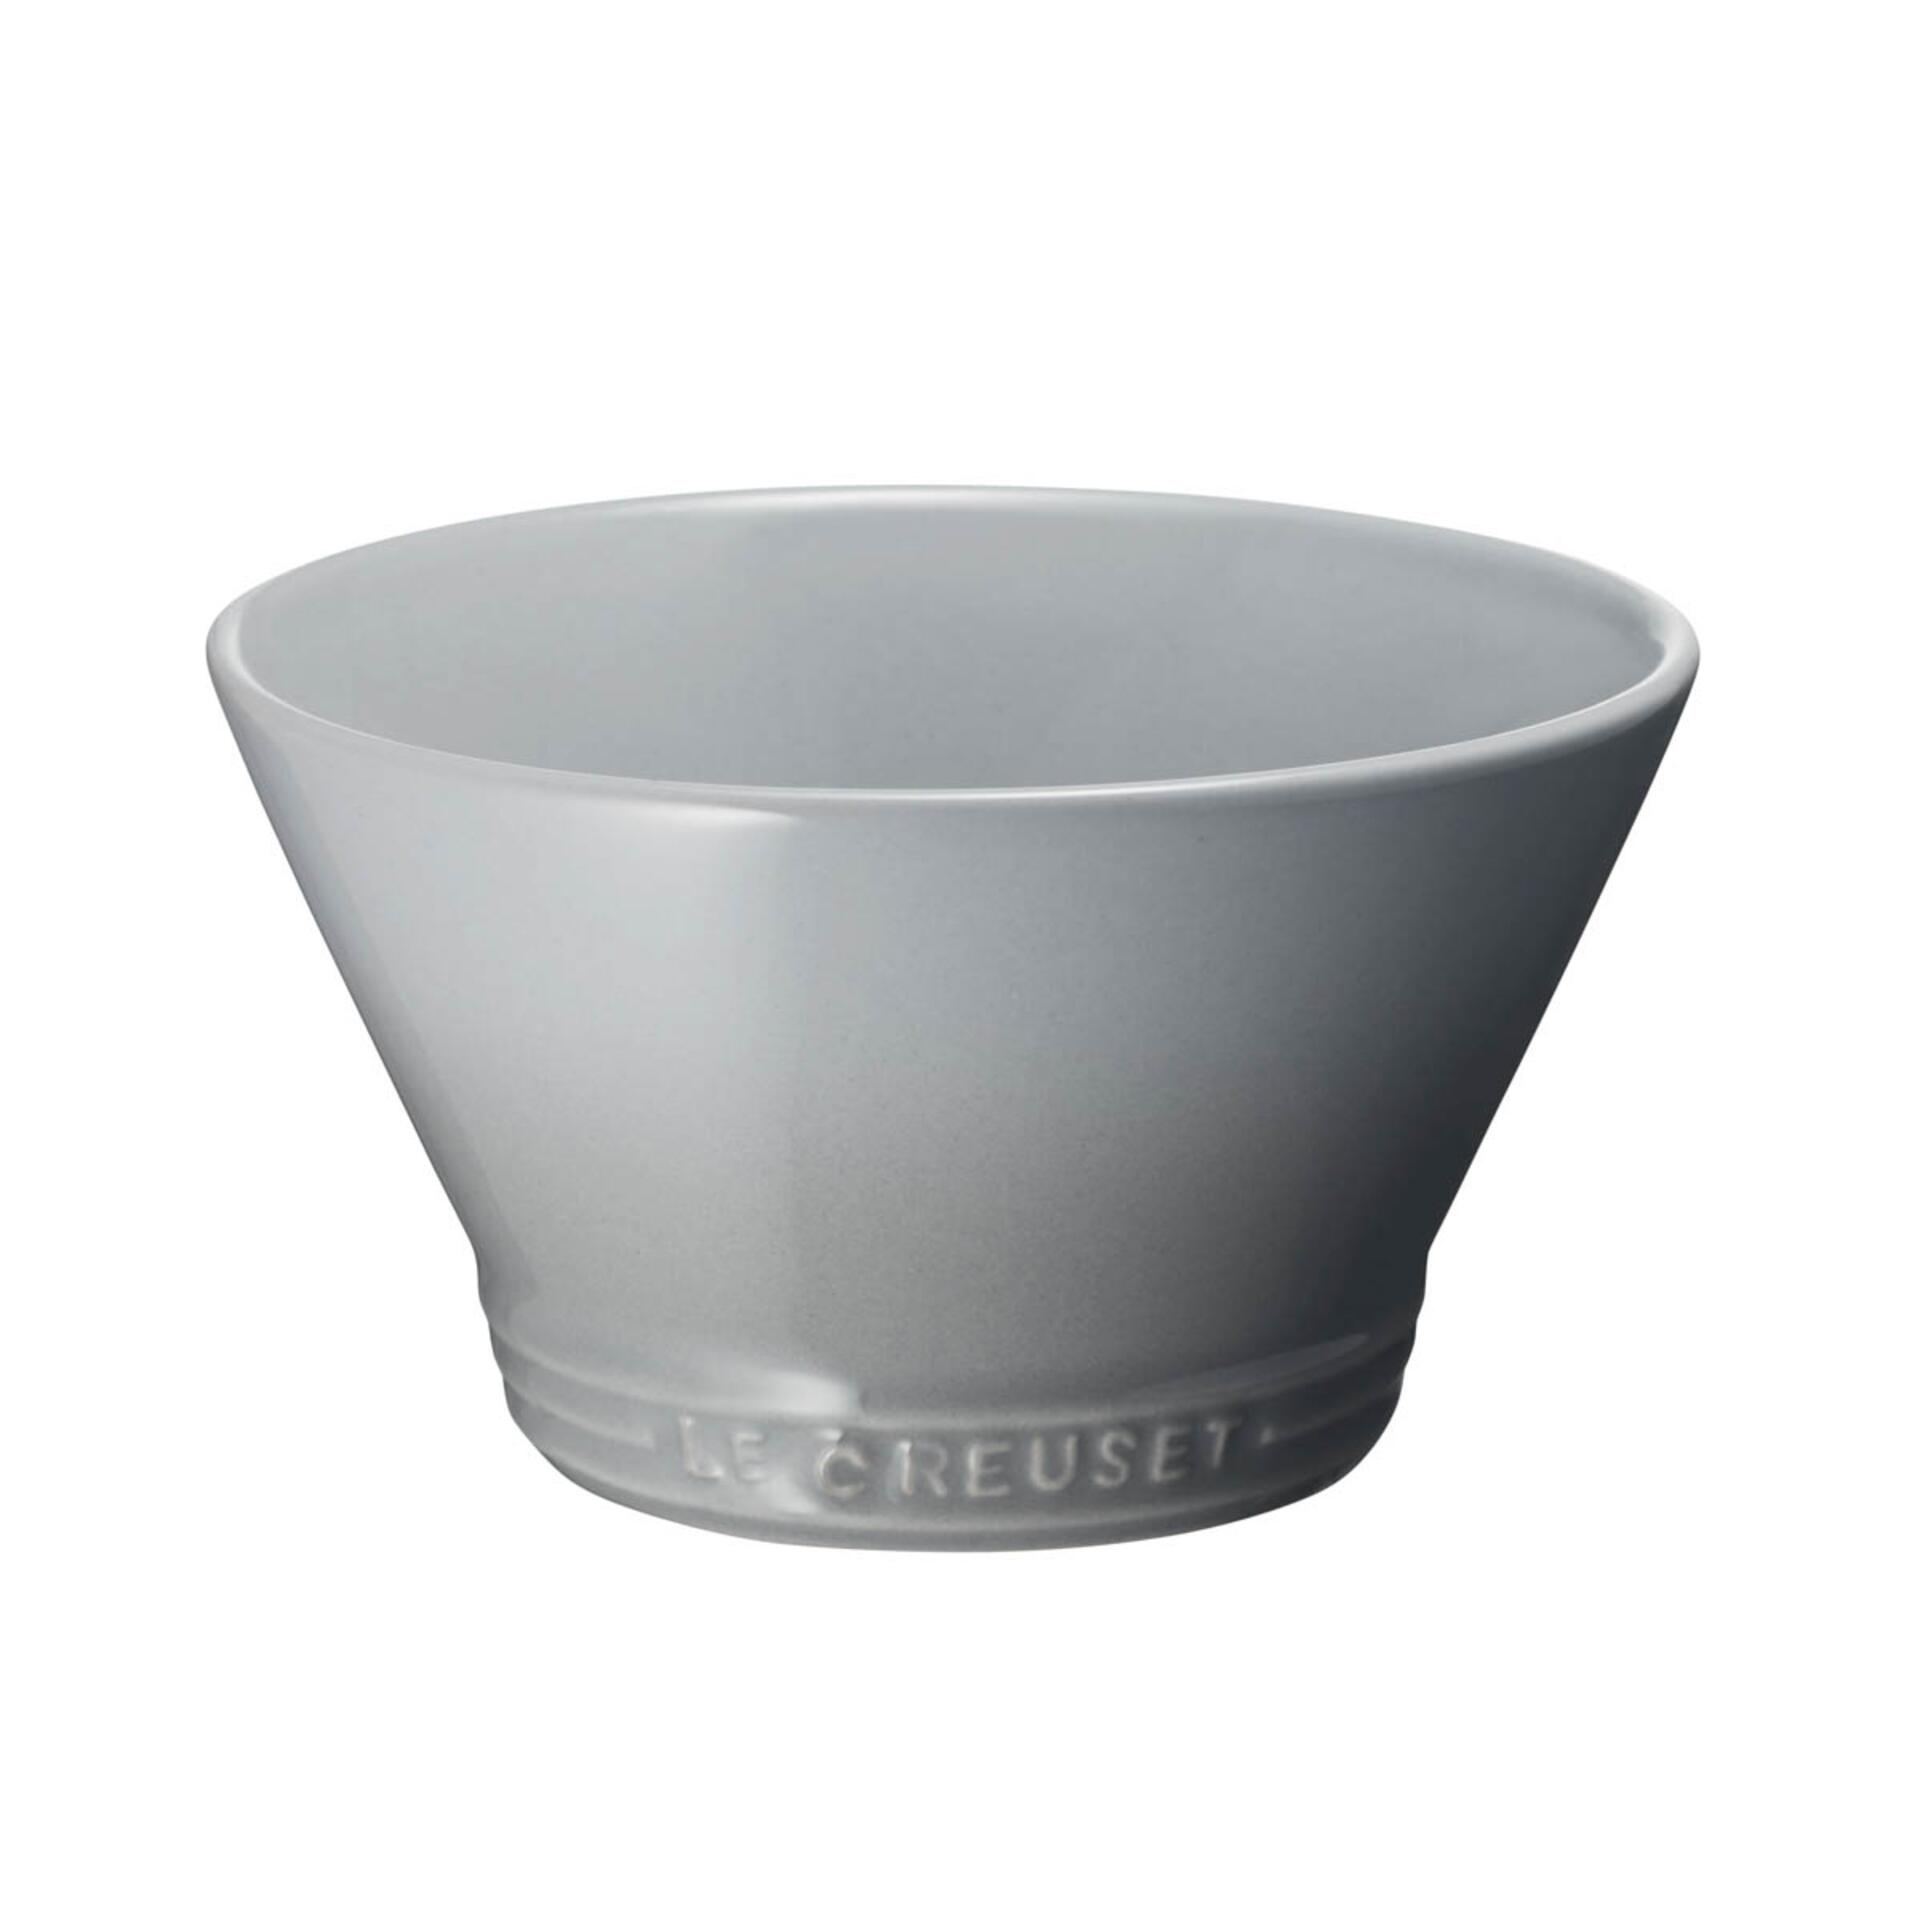 Le Creuset Kobe Schale 300 ml Perlgrau